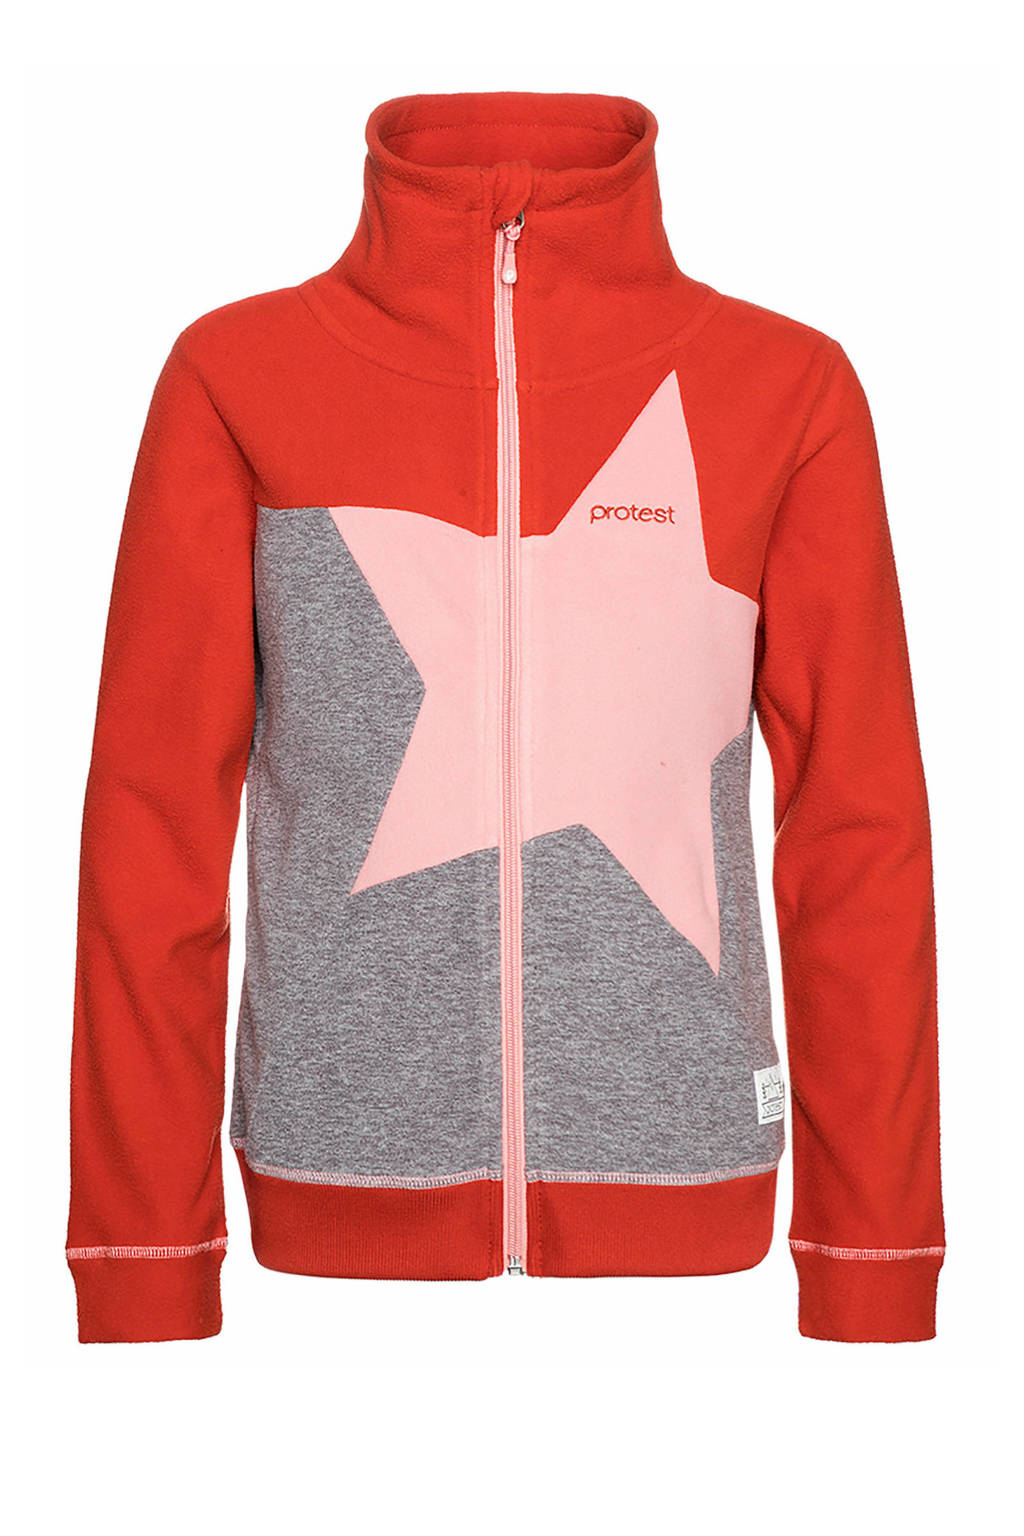 Protest fleece vest Bonita rood/grijs, DARK GREY MELEE